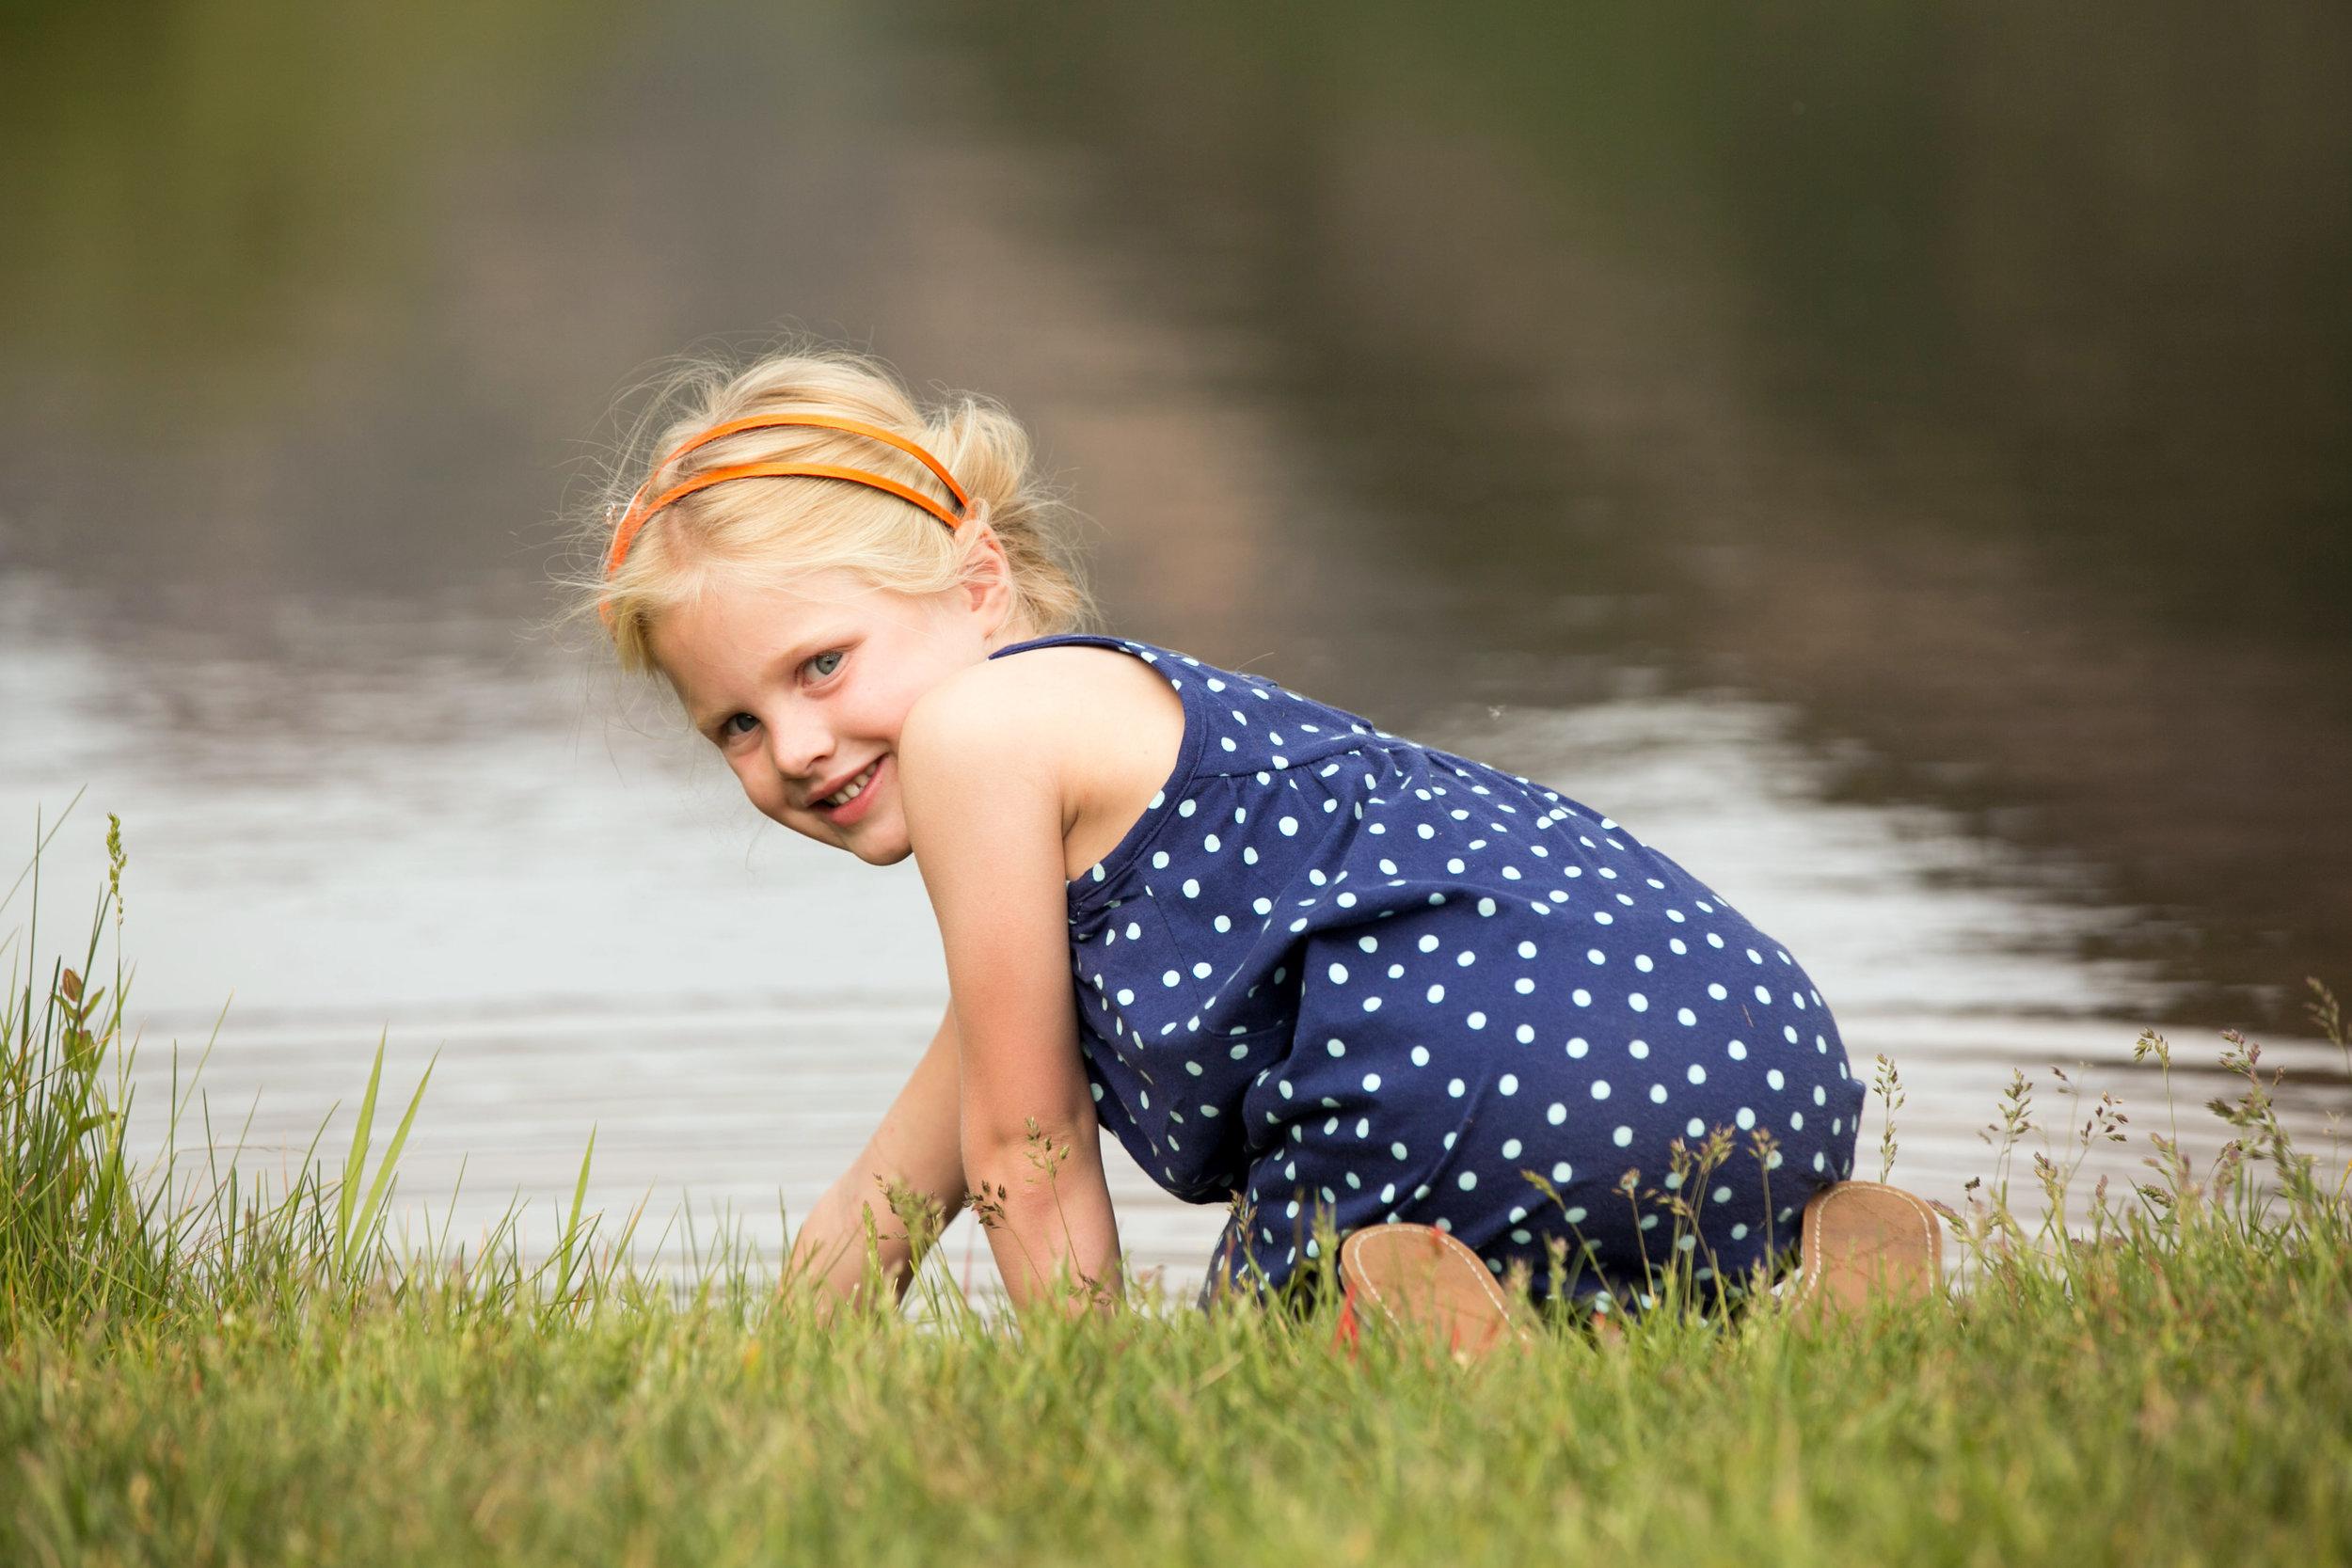 Childrens-photographer-Colorado-Axelphoto.jpg